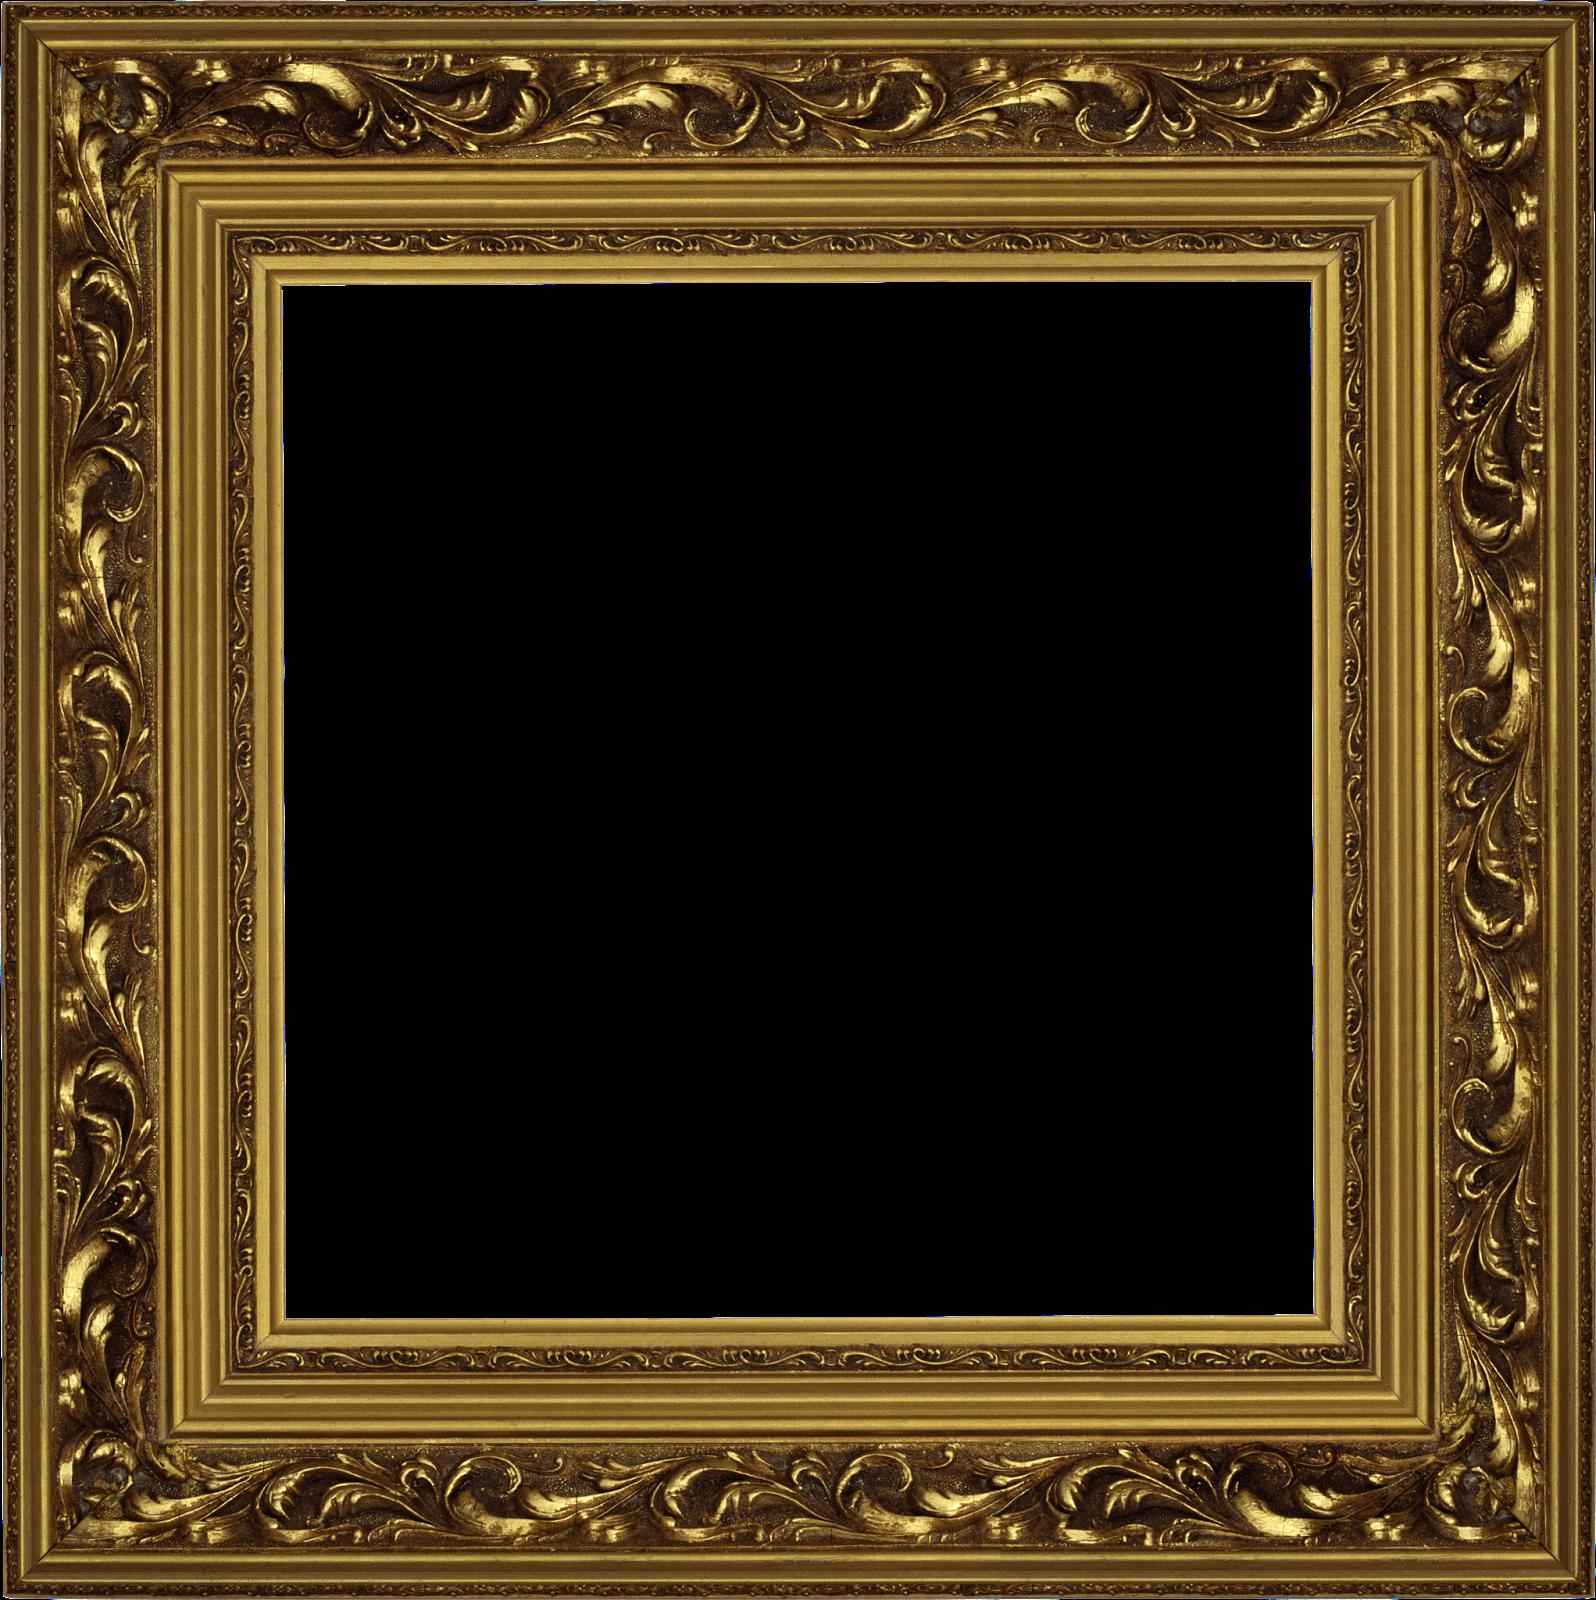 risultati immagini per marcos fotos